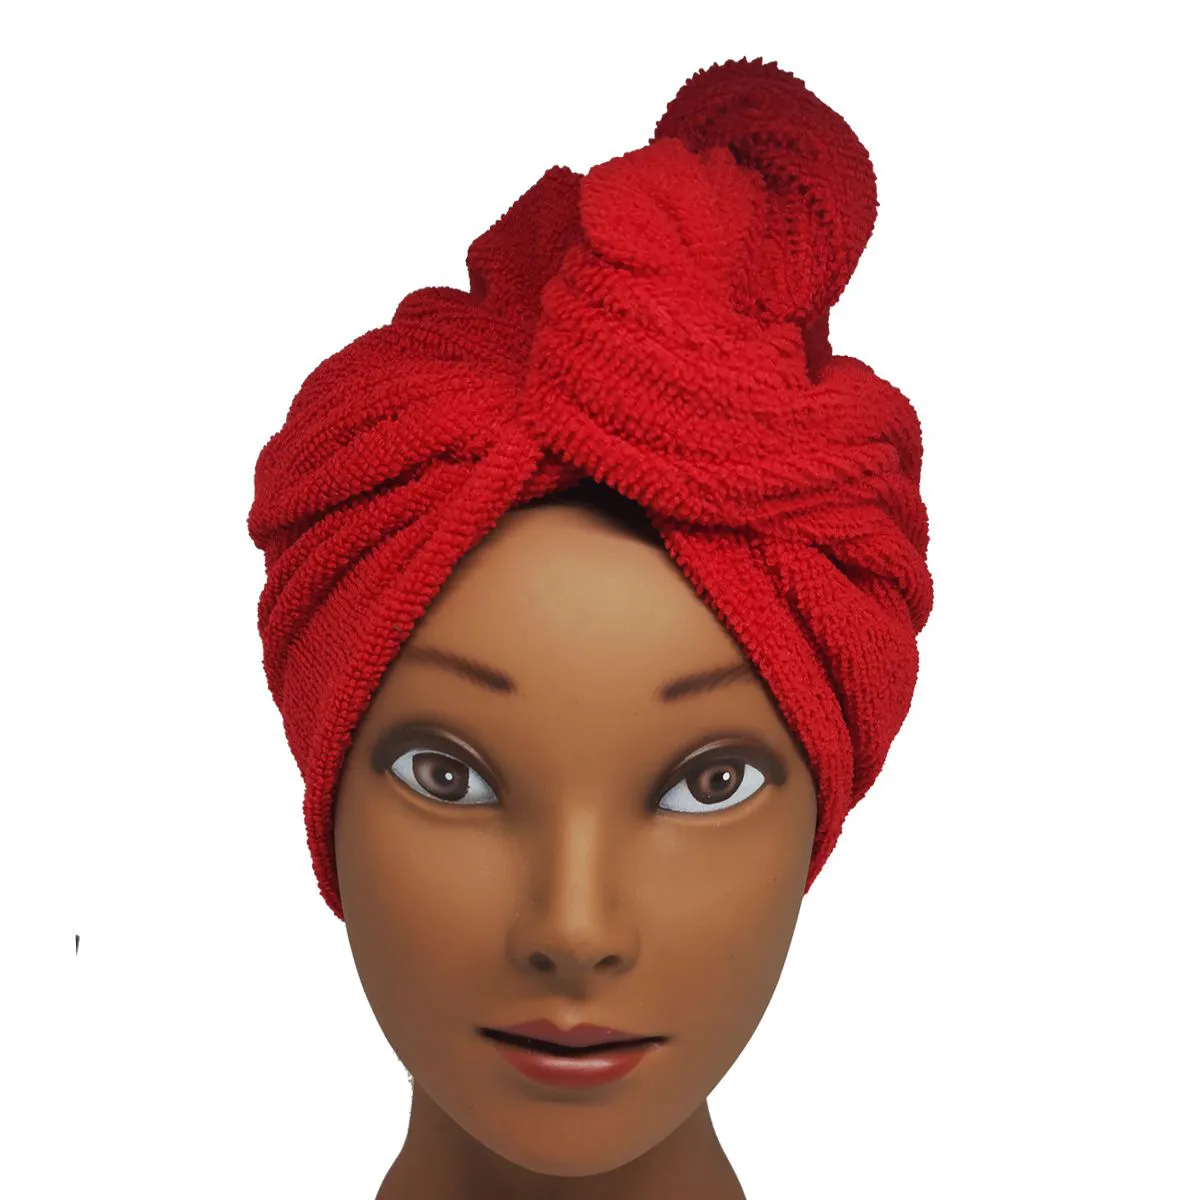 Toalha Turbante de Microfibra Vermelha - Grande